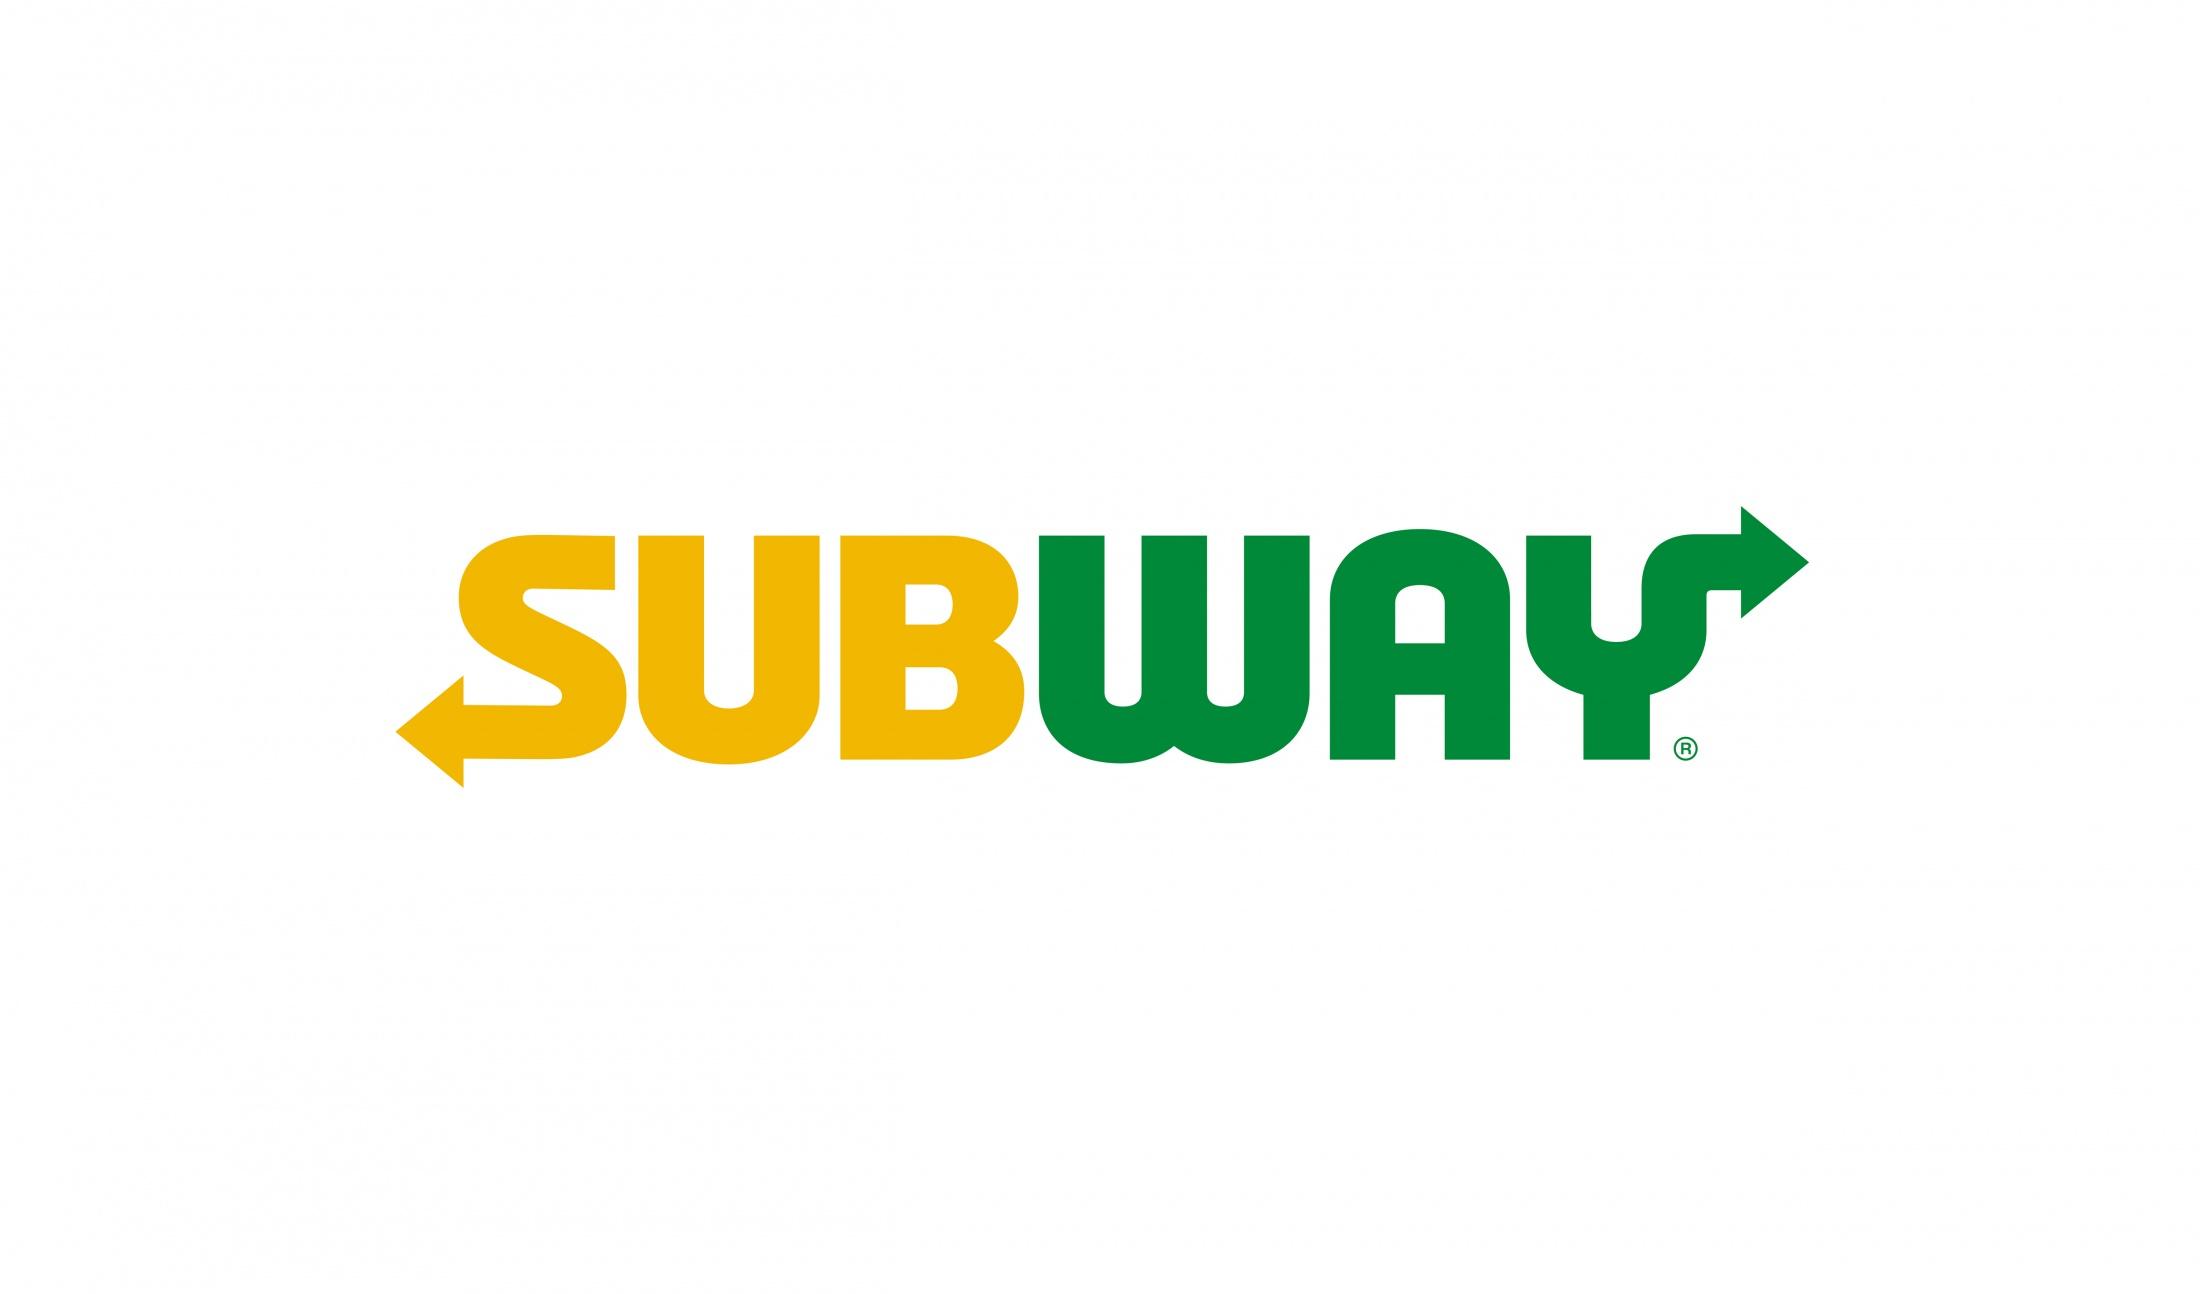 Thumbnail for Subway Visual Identity